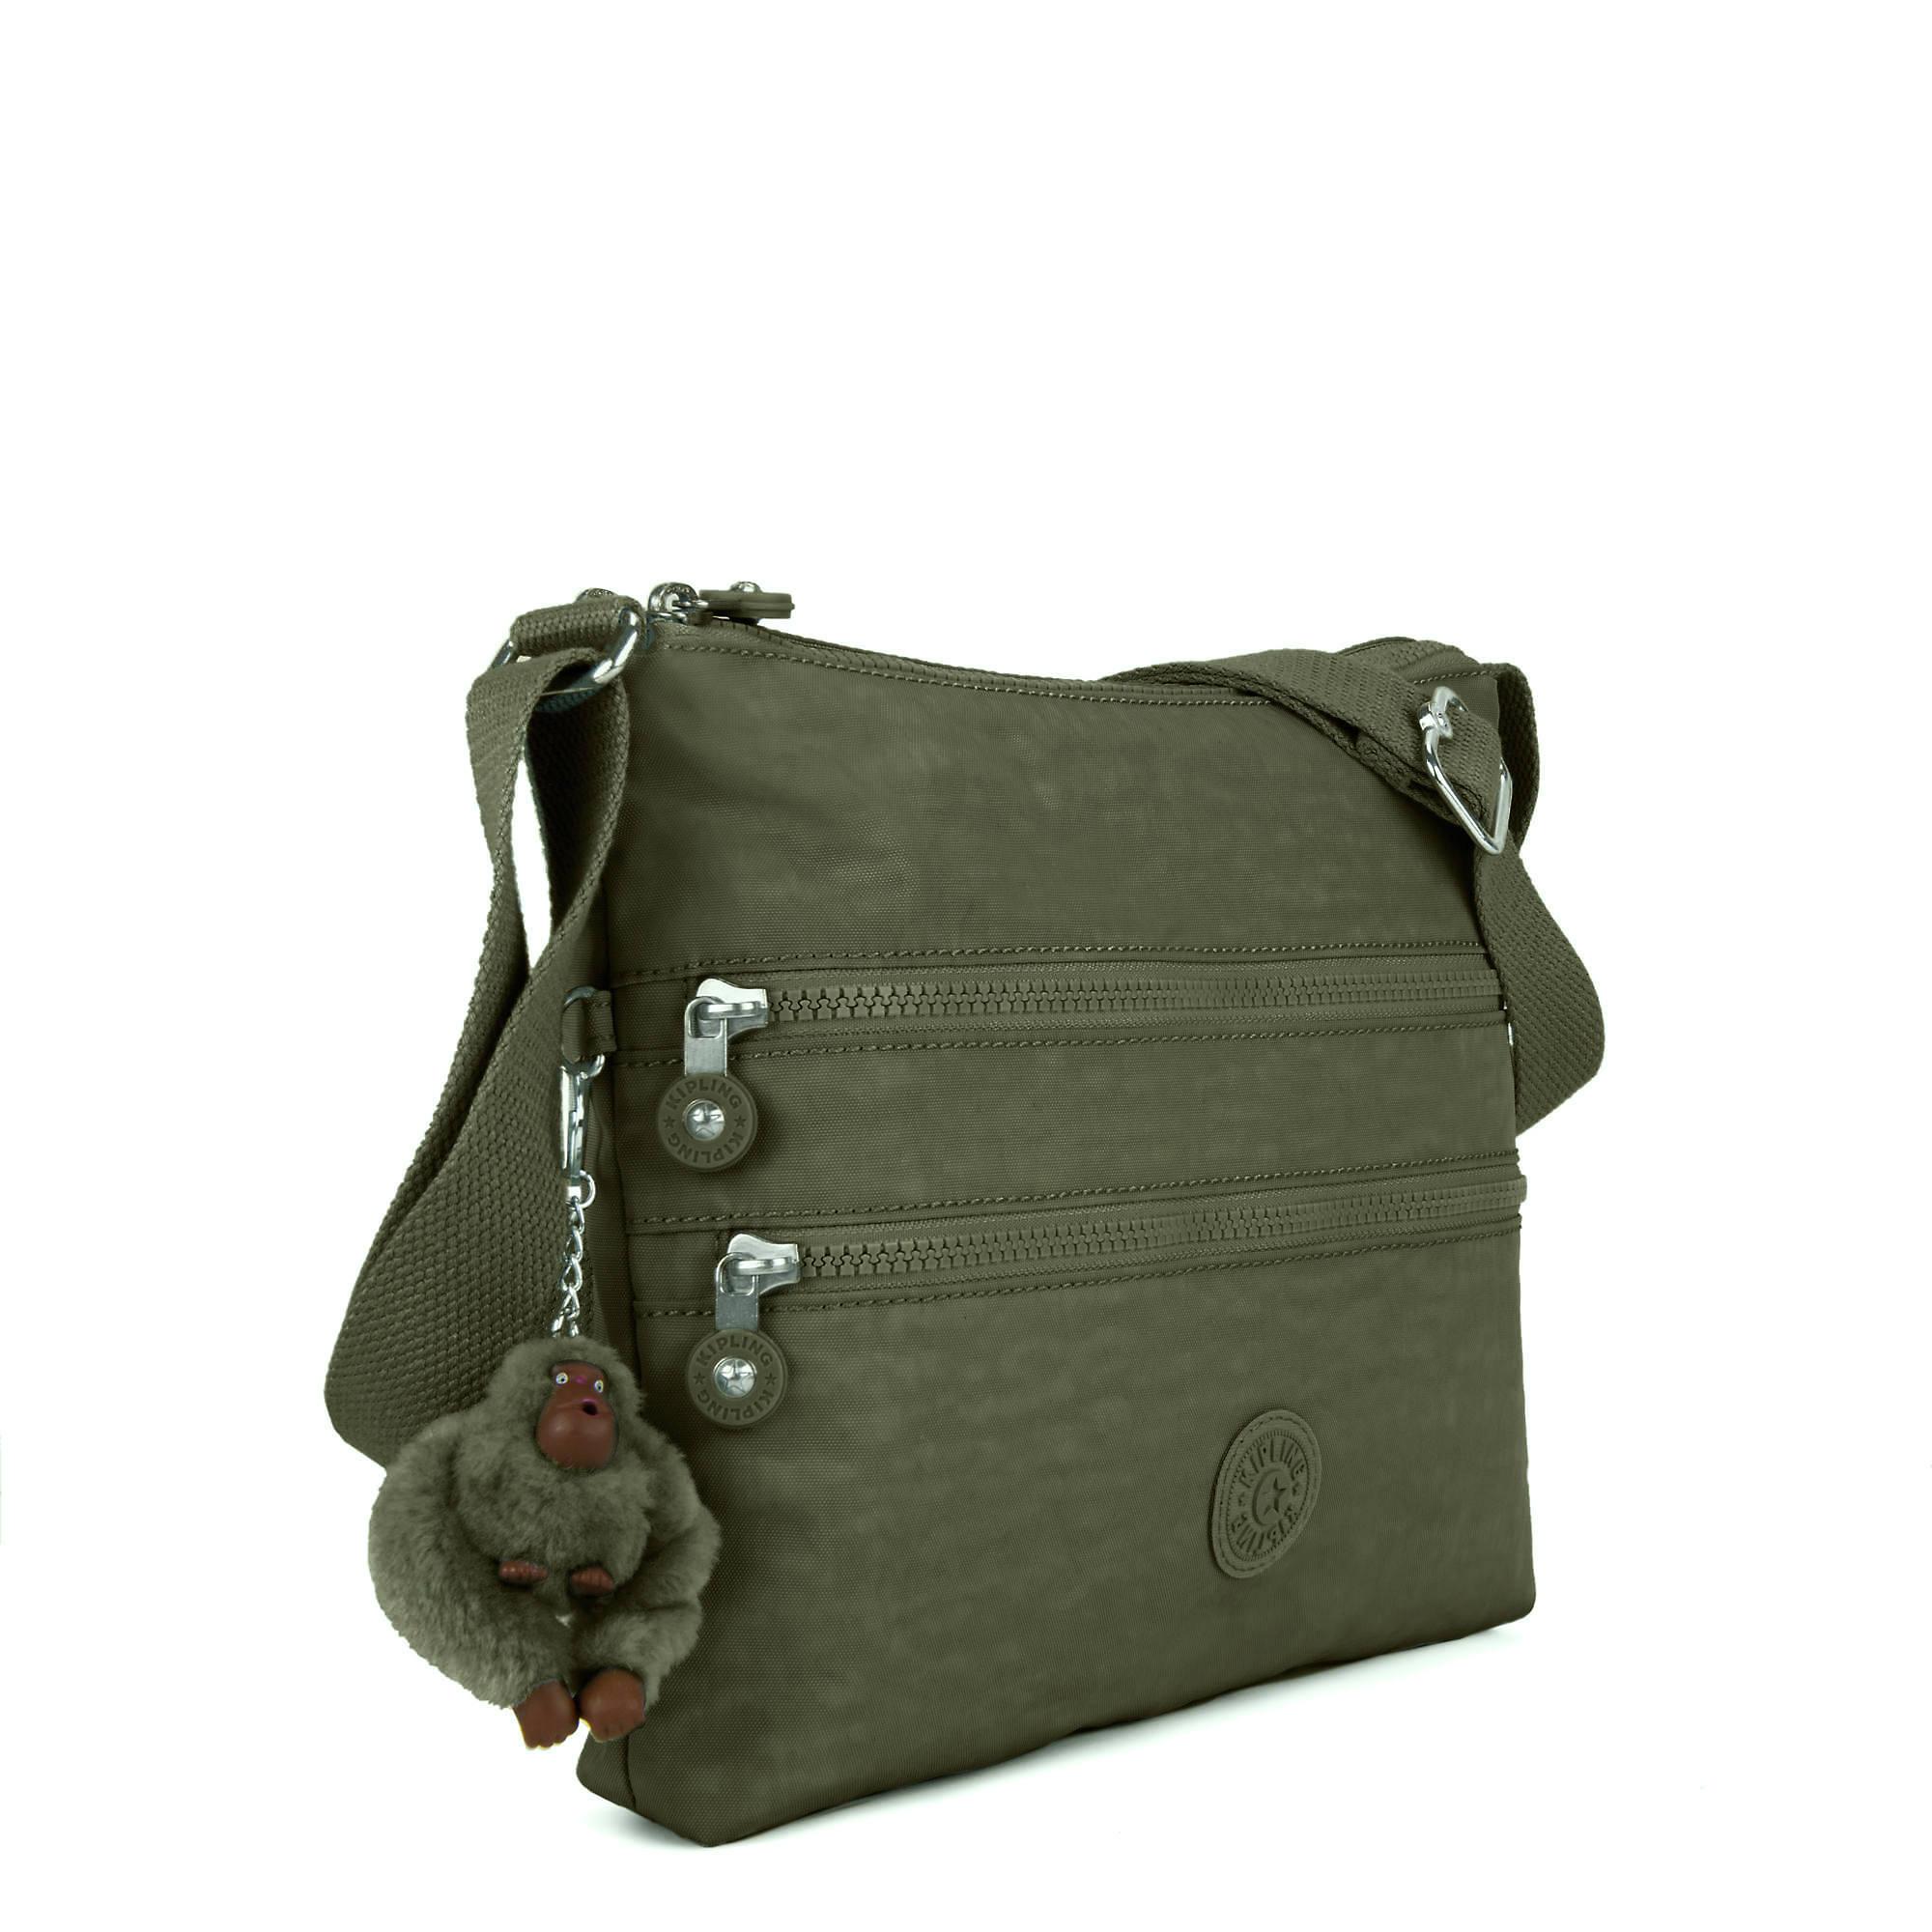 Kipling-Alvar-Metallic-Crossbody-Bag miniature 29